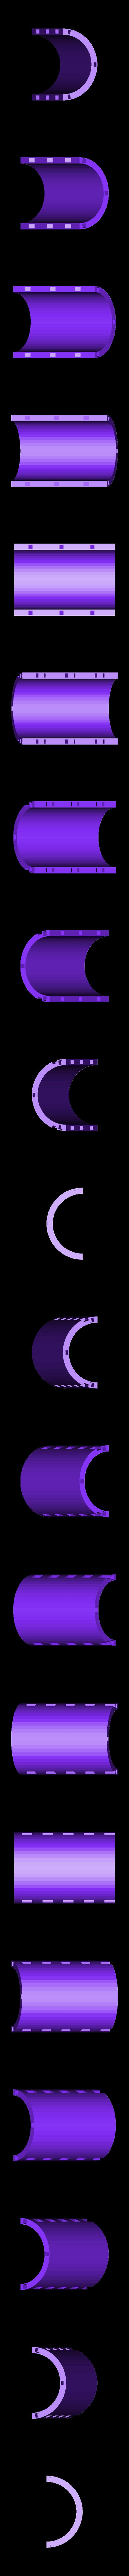 Case_Bottom.stl Download free STL file Archimedes Screw Bonanza • 3D printer design, Urulysman